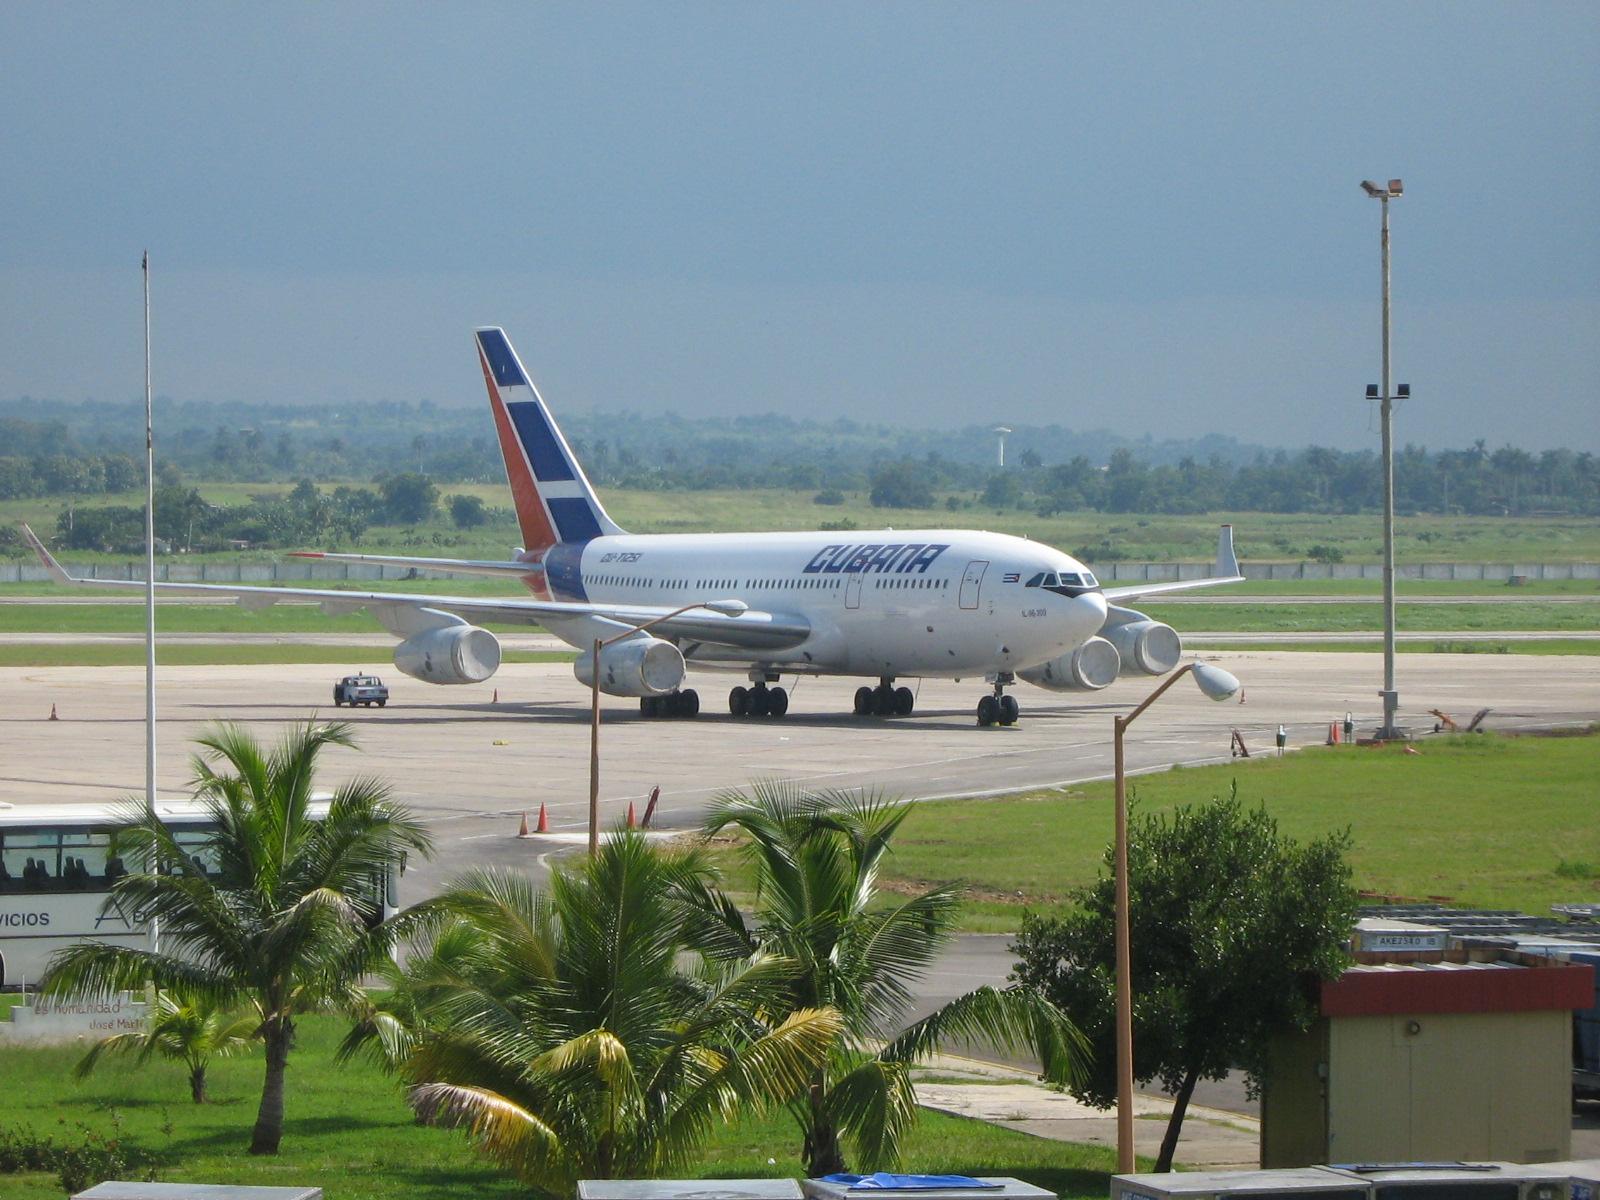 Aeroporto Havana Arrivi : Cubana flight crashes after taking off from havana airport